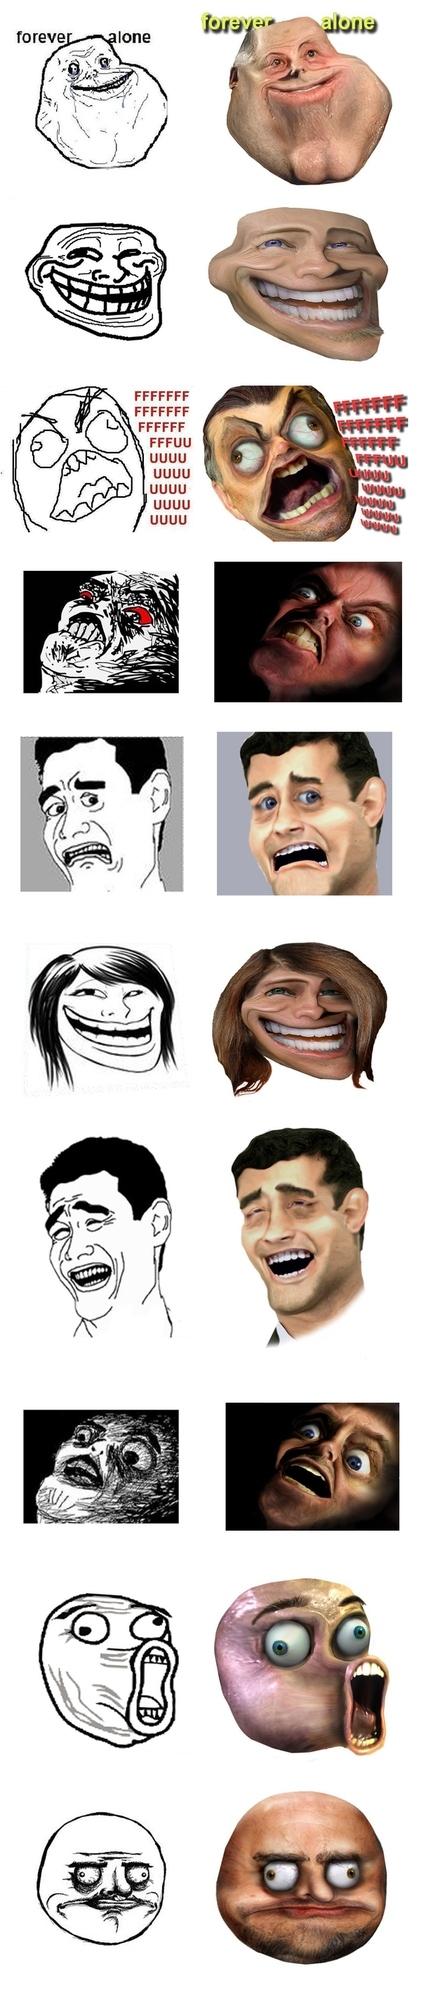 10 Reaction Faces Untooned